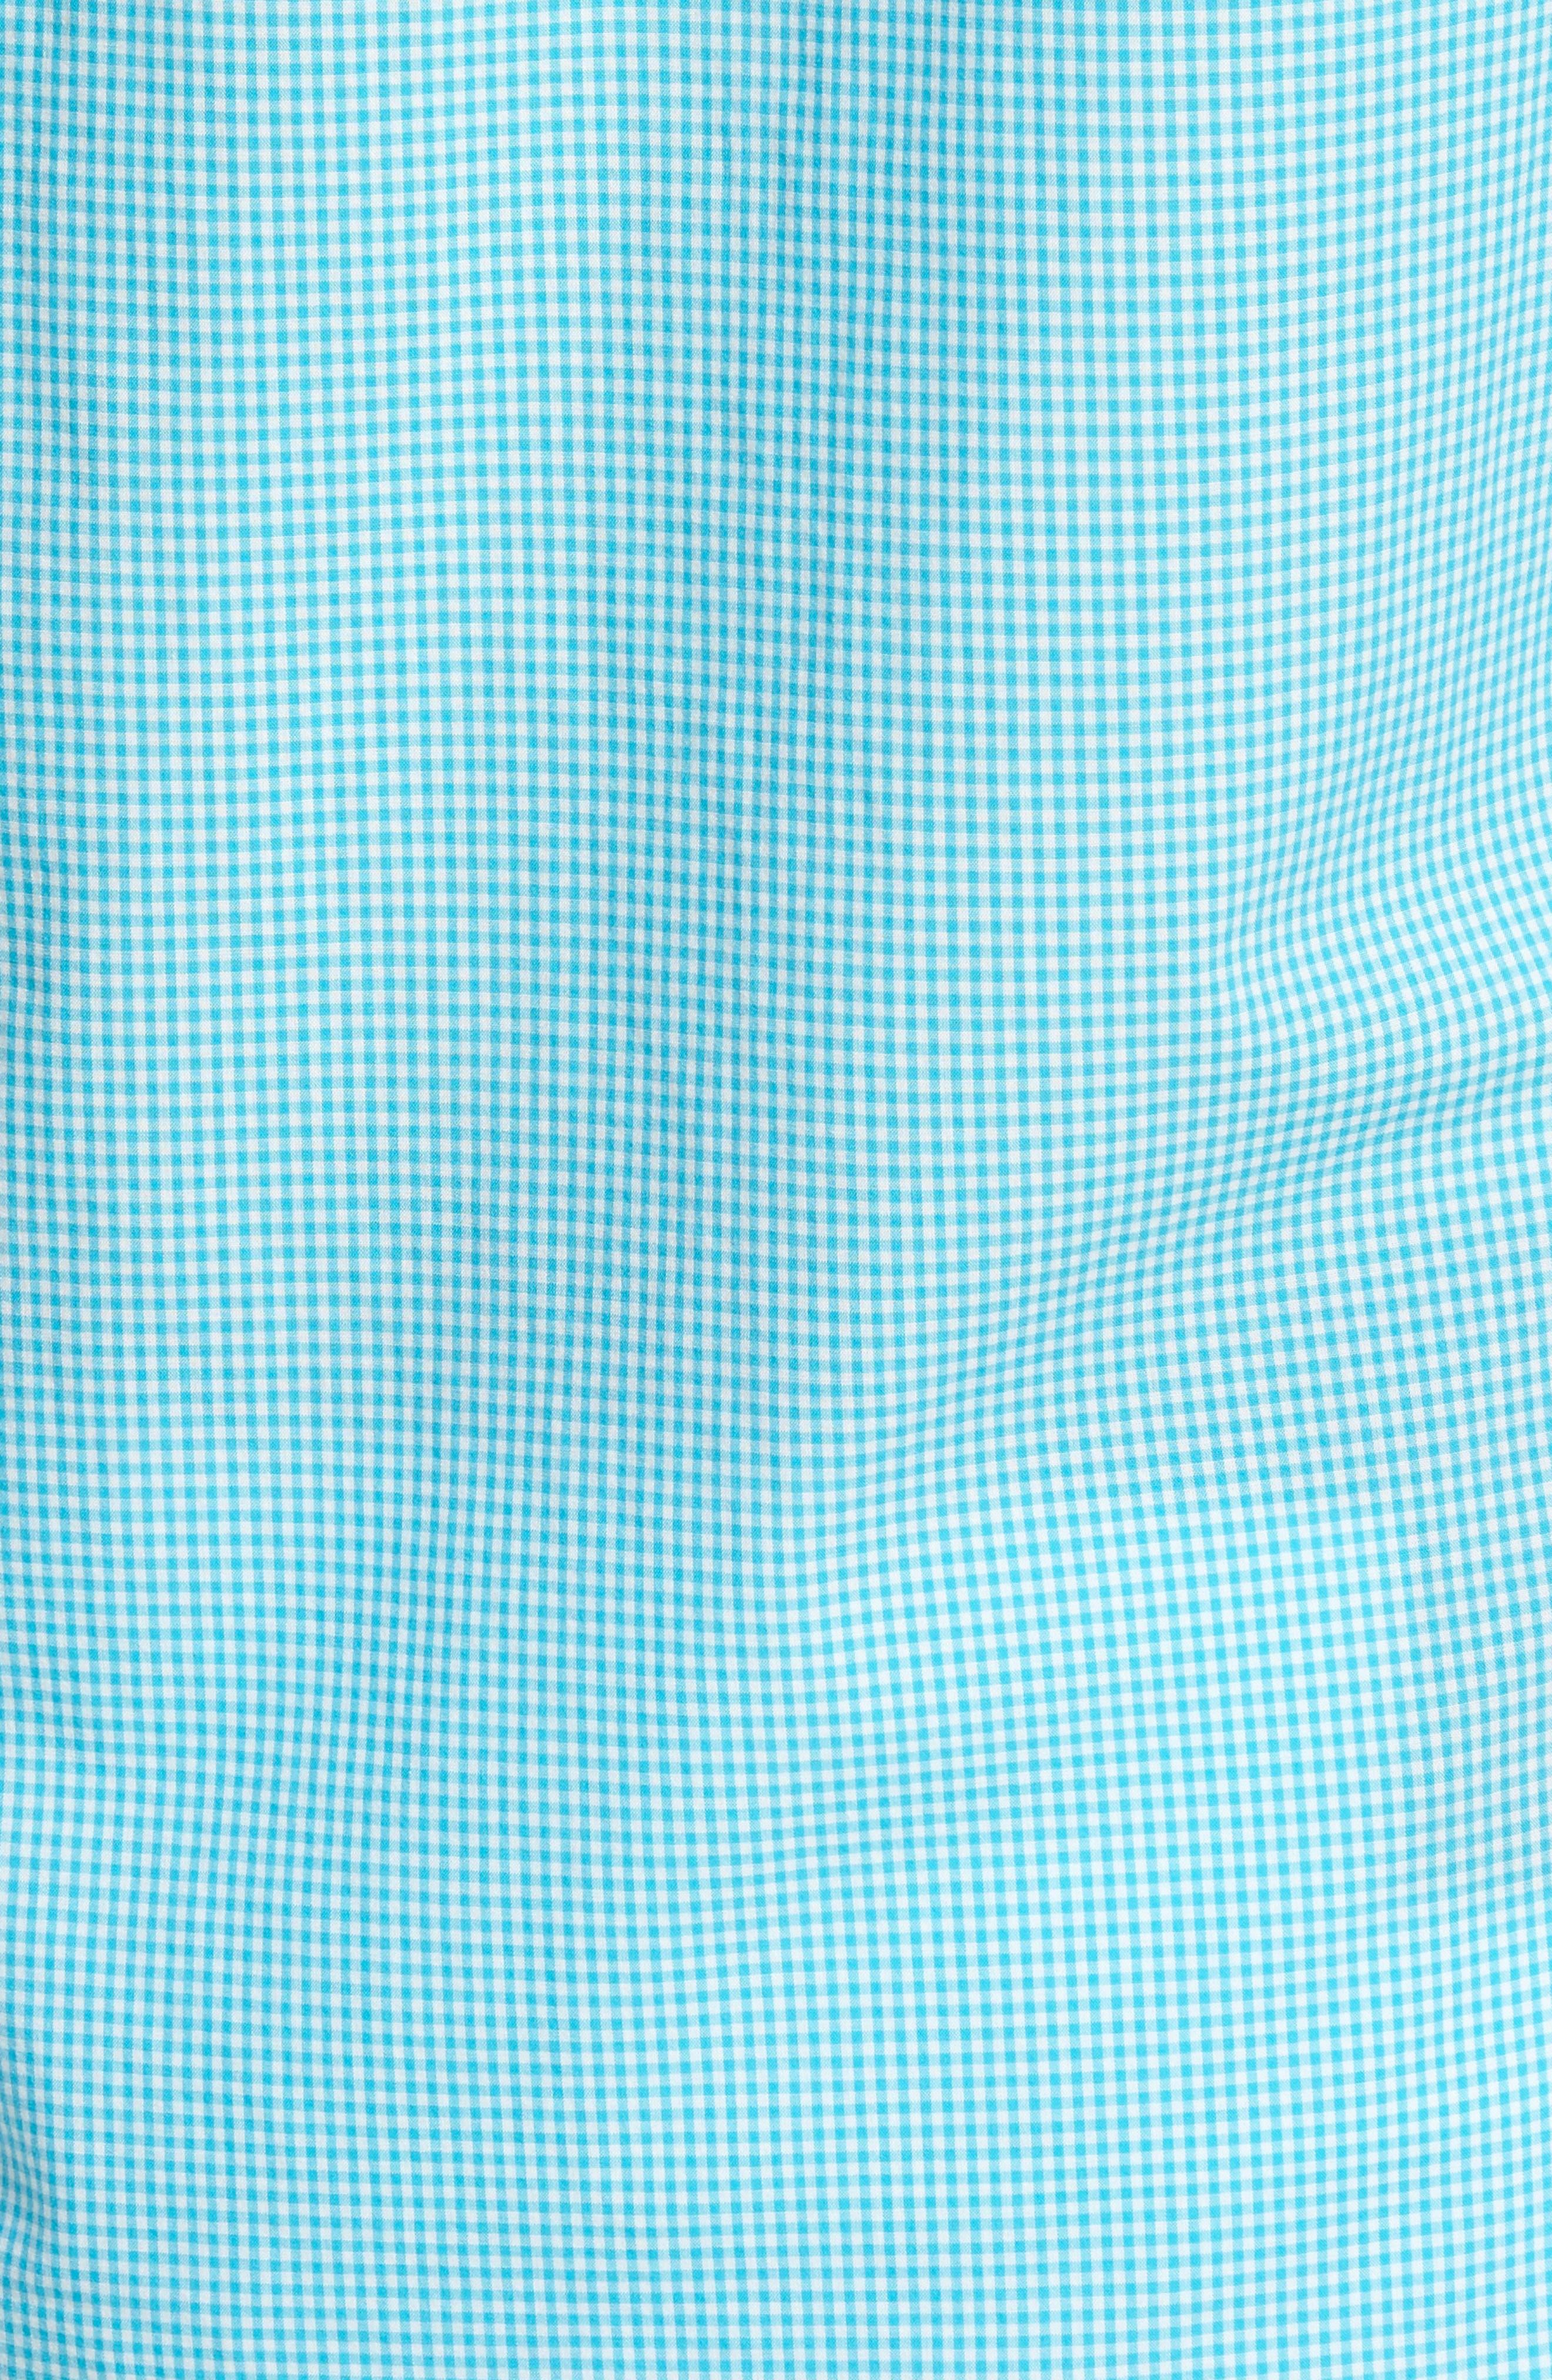 Slim Fit Summerweight Check Sport Shirt,                             Alternate thumbnail 5, color,                             Bondi Gingham - Scuba Blue